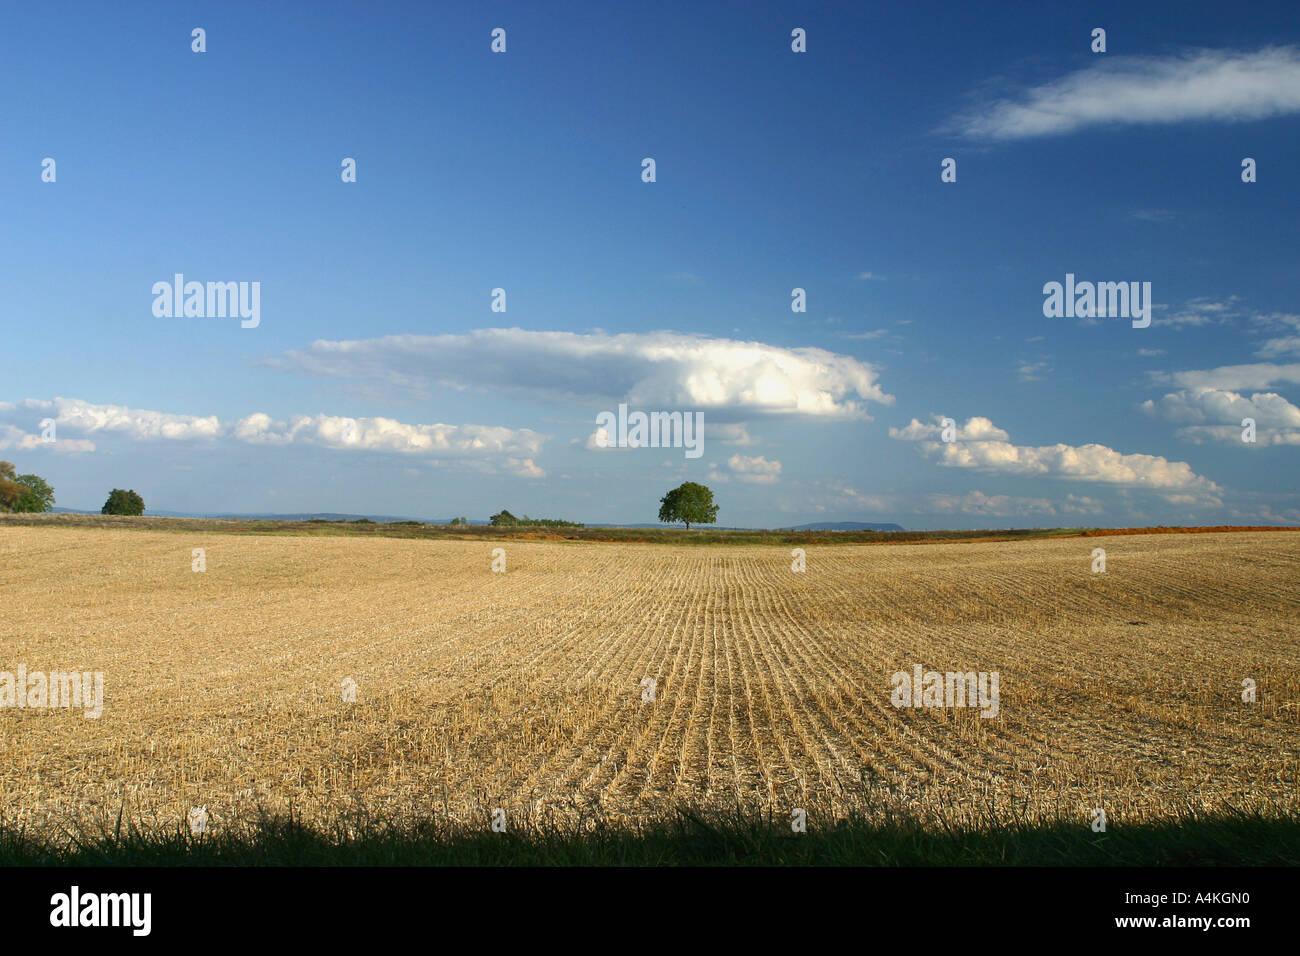 France, Jura, wheatfield - Stock Image